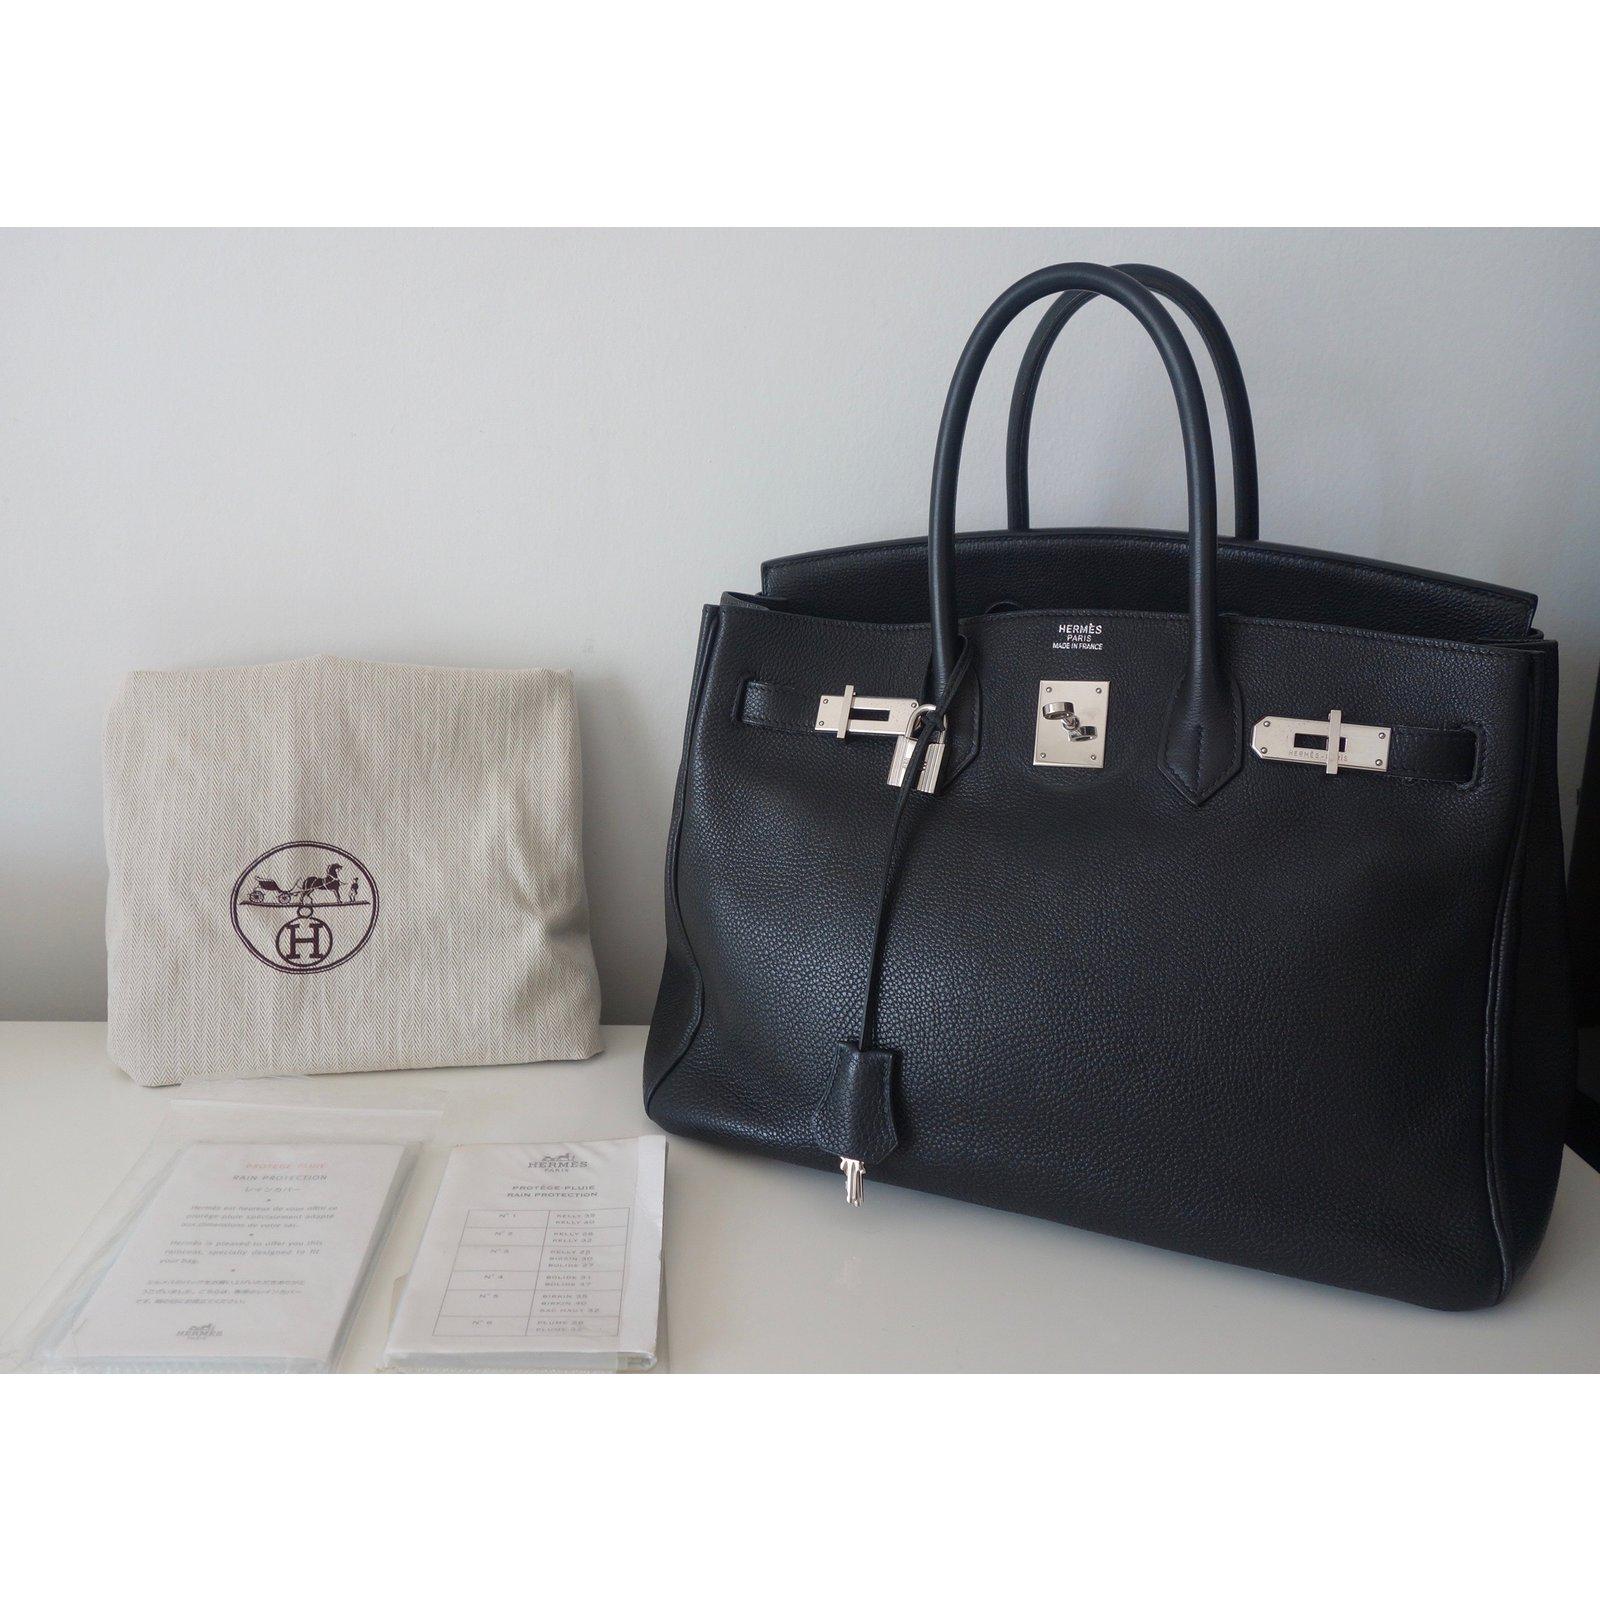 86de954c93 Hermès Birkin 35 Handbags Leather Black ref.37538 - Joli Closet